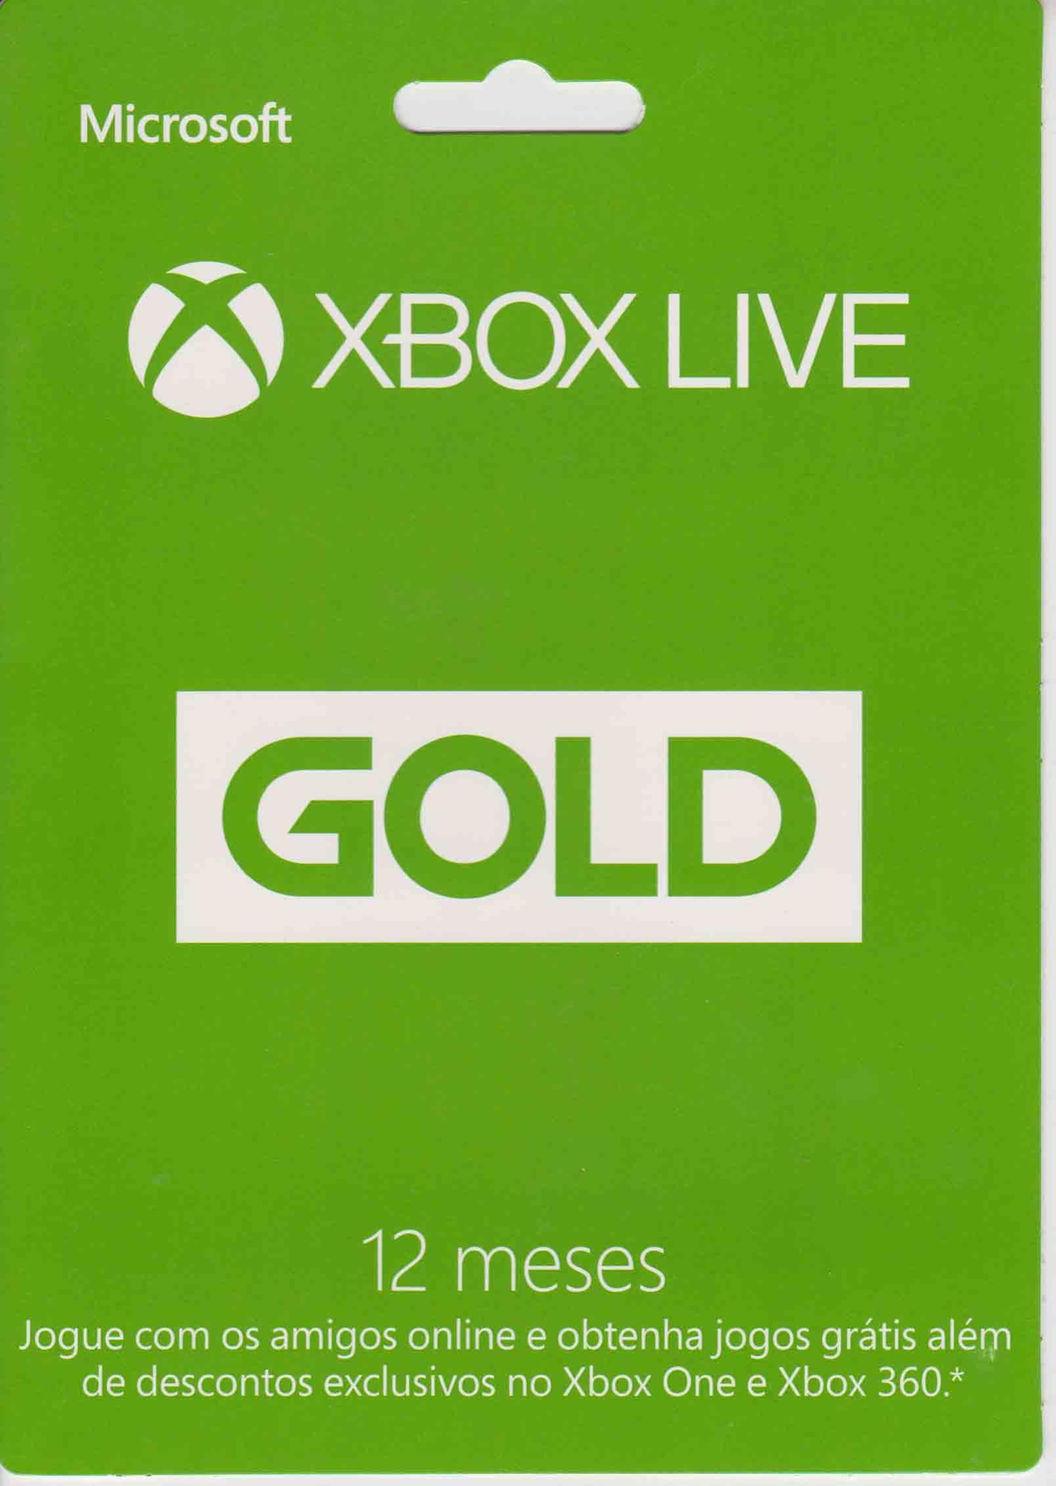 [Digitec.ch] Microsoft Xbox Live Gold (Xbox 360, Xbox One, 12Monate) für CHF 33 / EURO 30,78